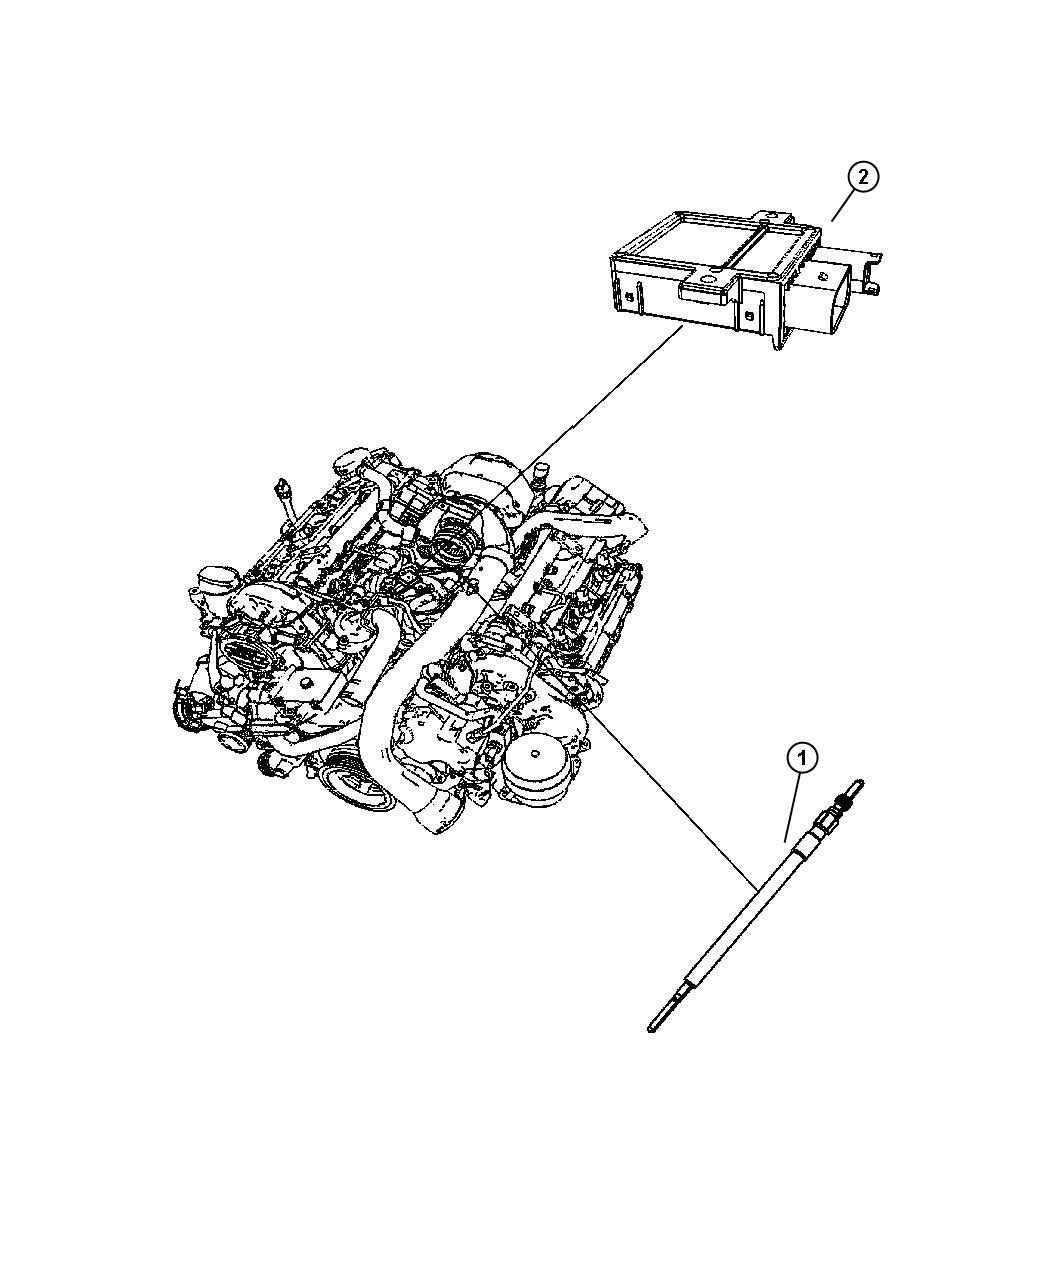 Dodge Sprinter Module Glow Plug Plugs Engine Electrical